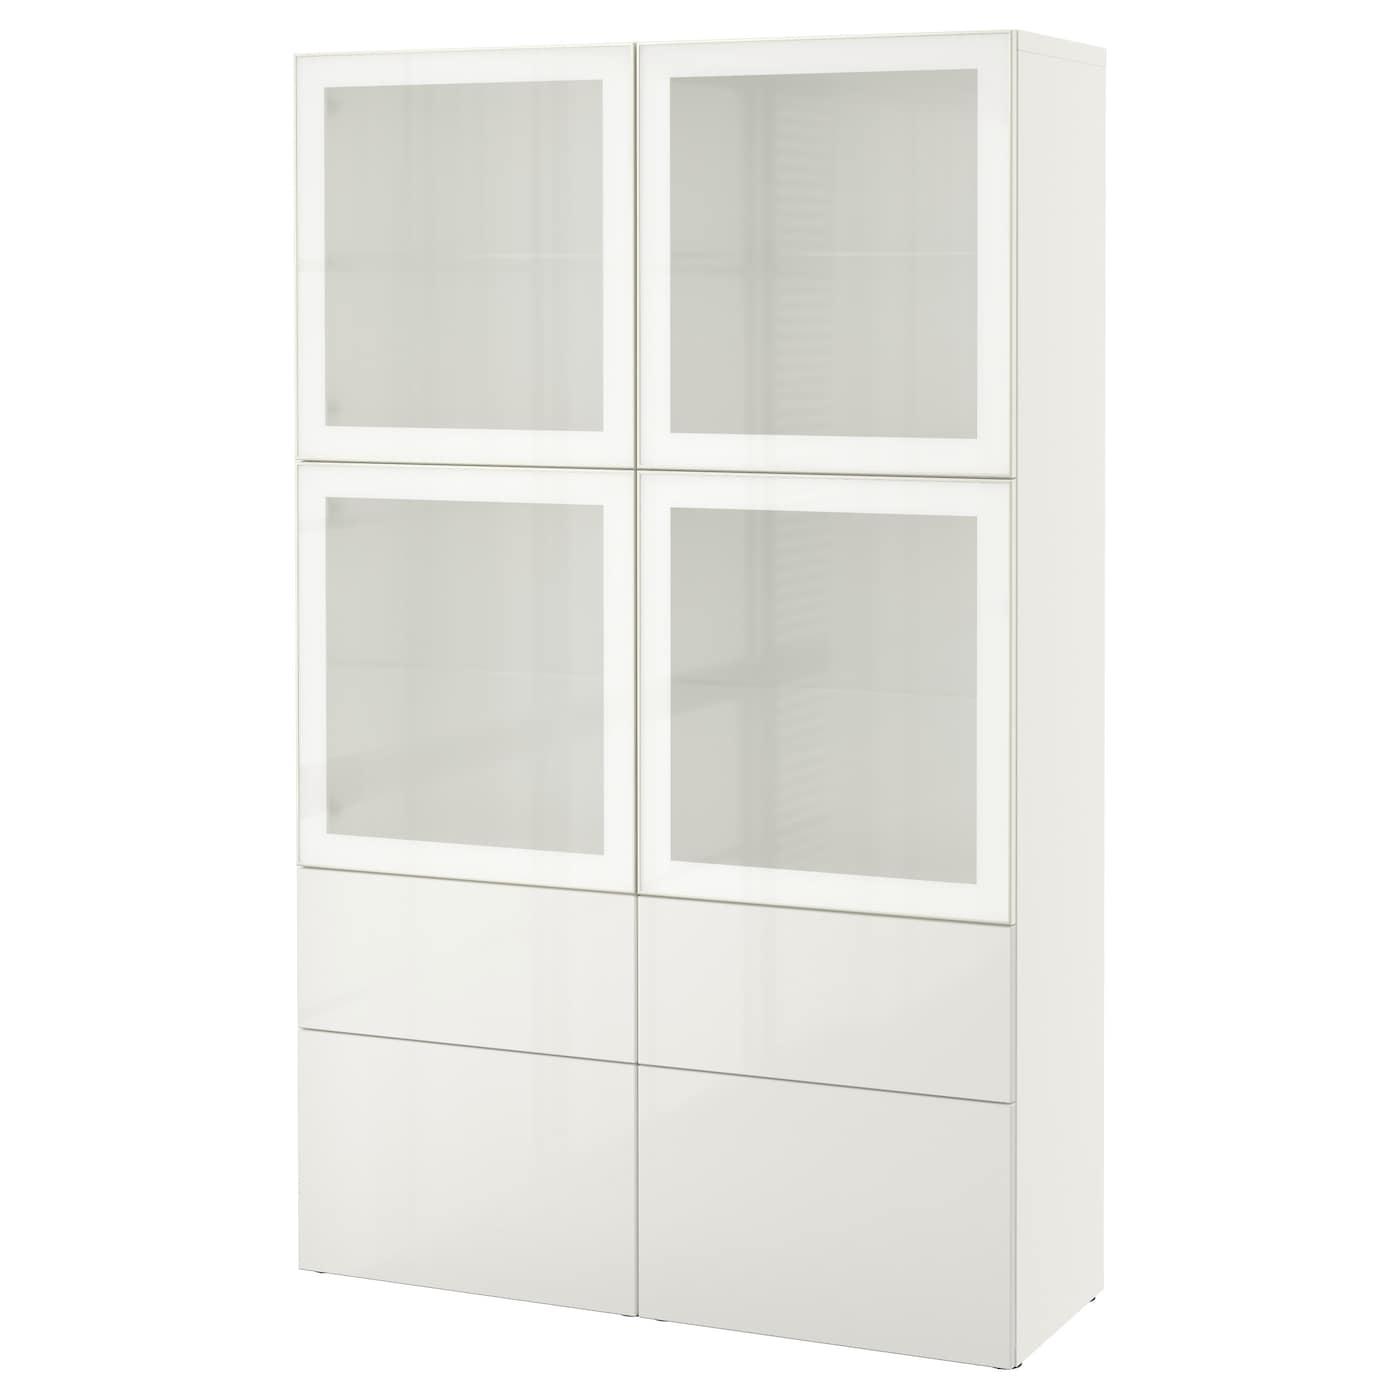 best storage combination w glass doors white selsviken. Black Bedroom Furniture Sets. Home Design Ideas